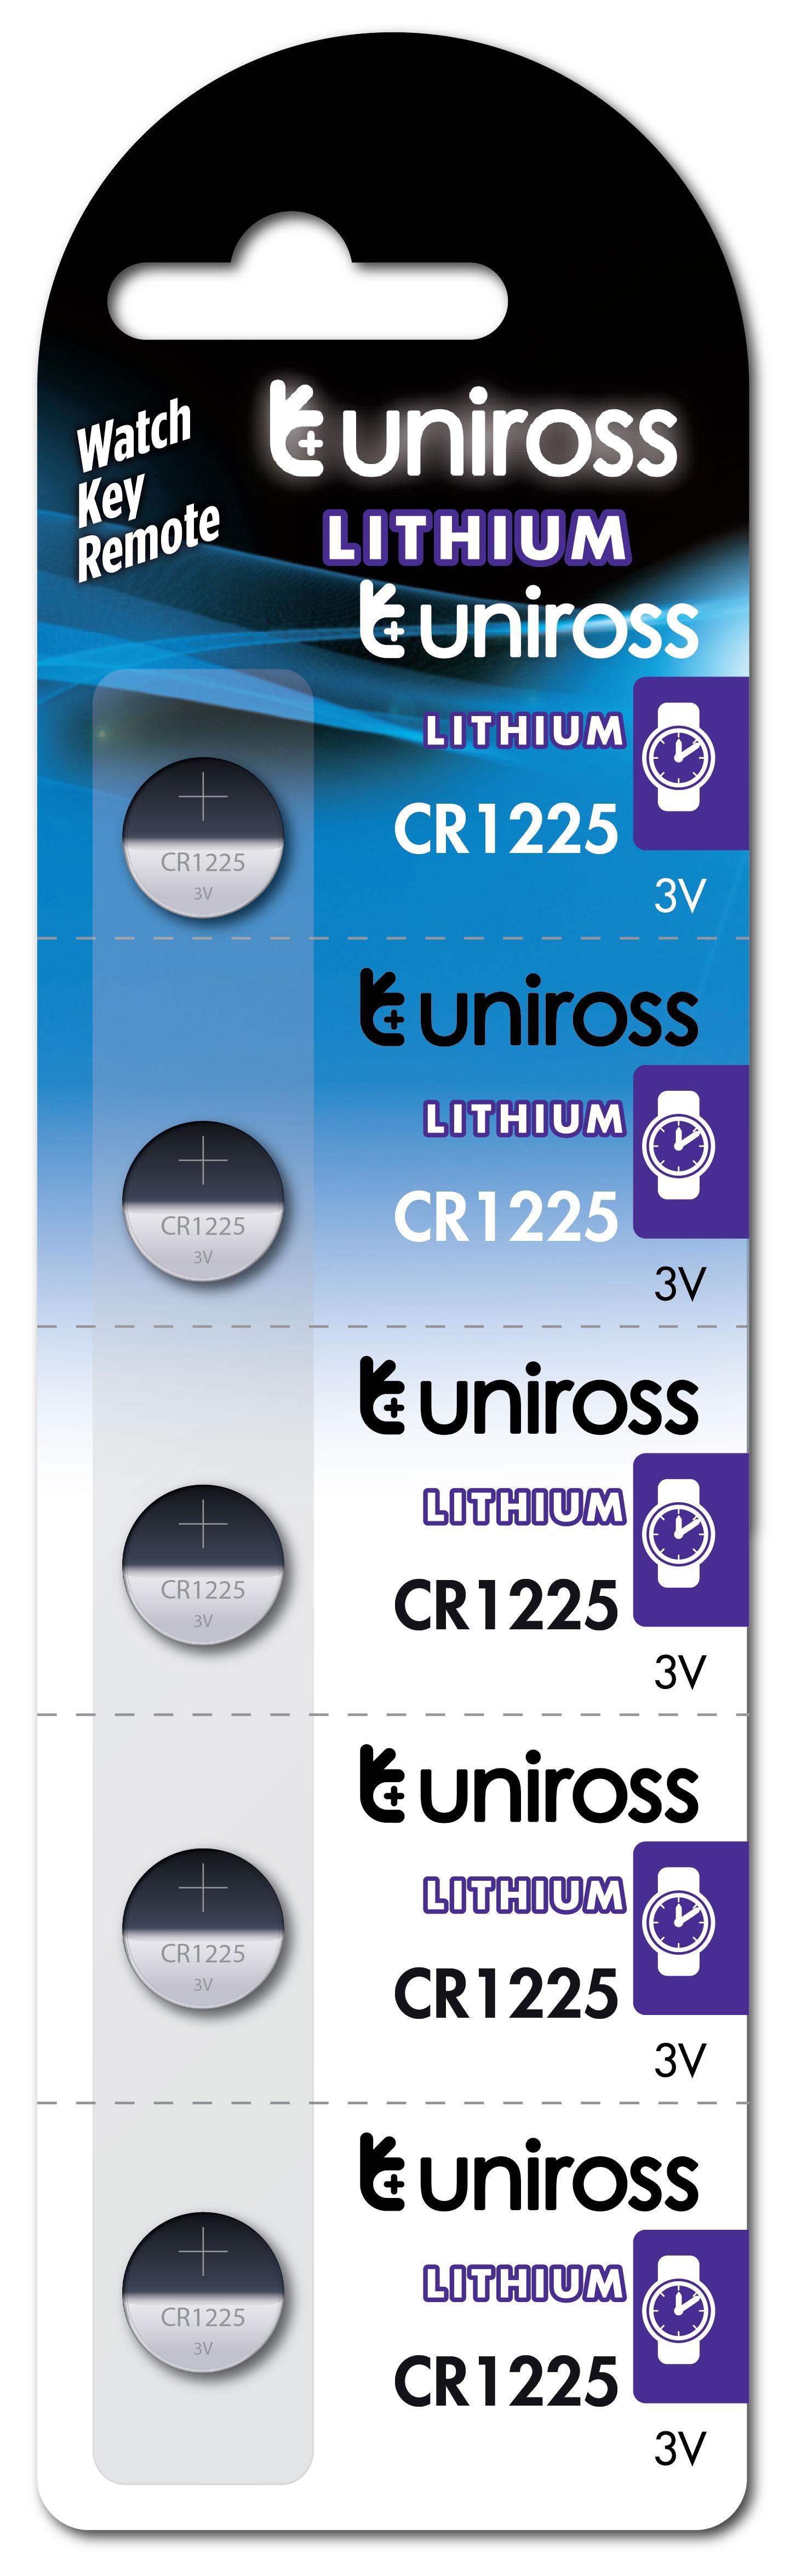 Button_Cell_[U5CR1225] UNIROSS BP5 CR1225 LITHIUM.jpg